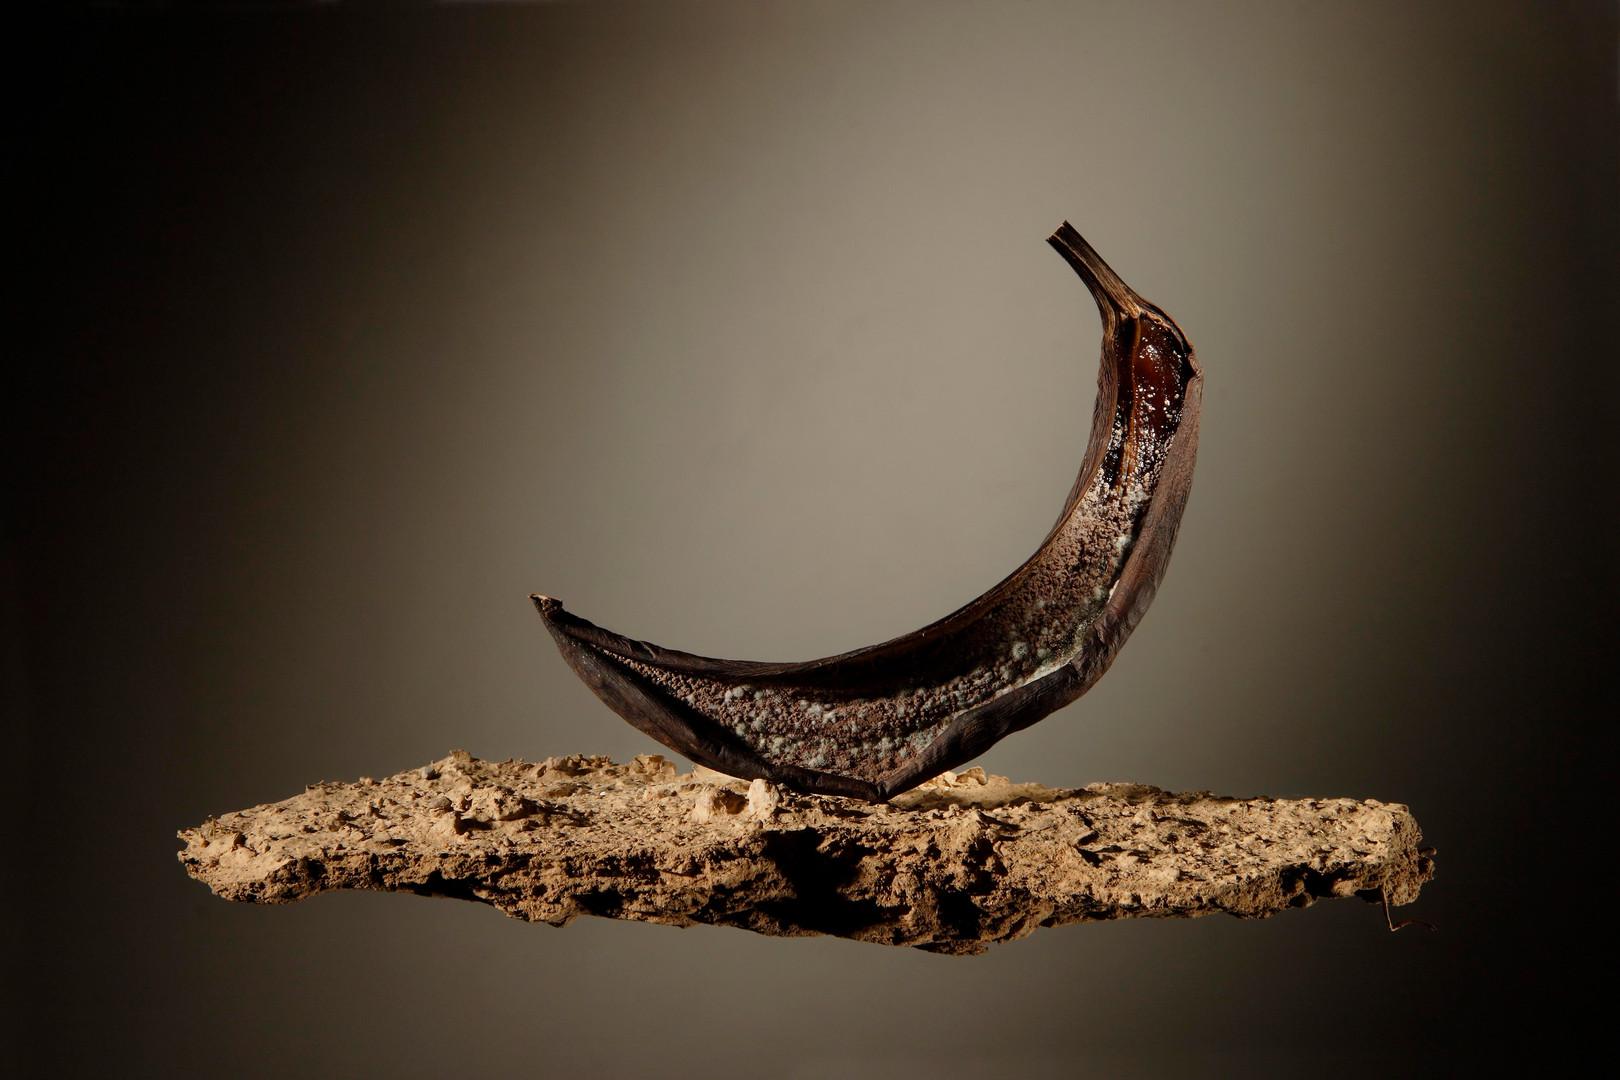 nau_banana wix.jpg